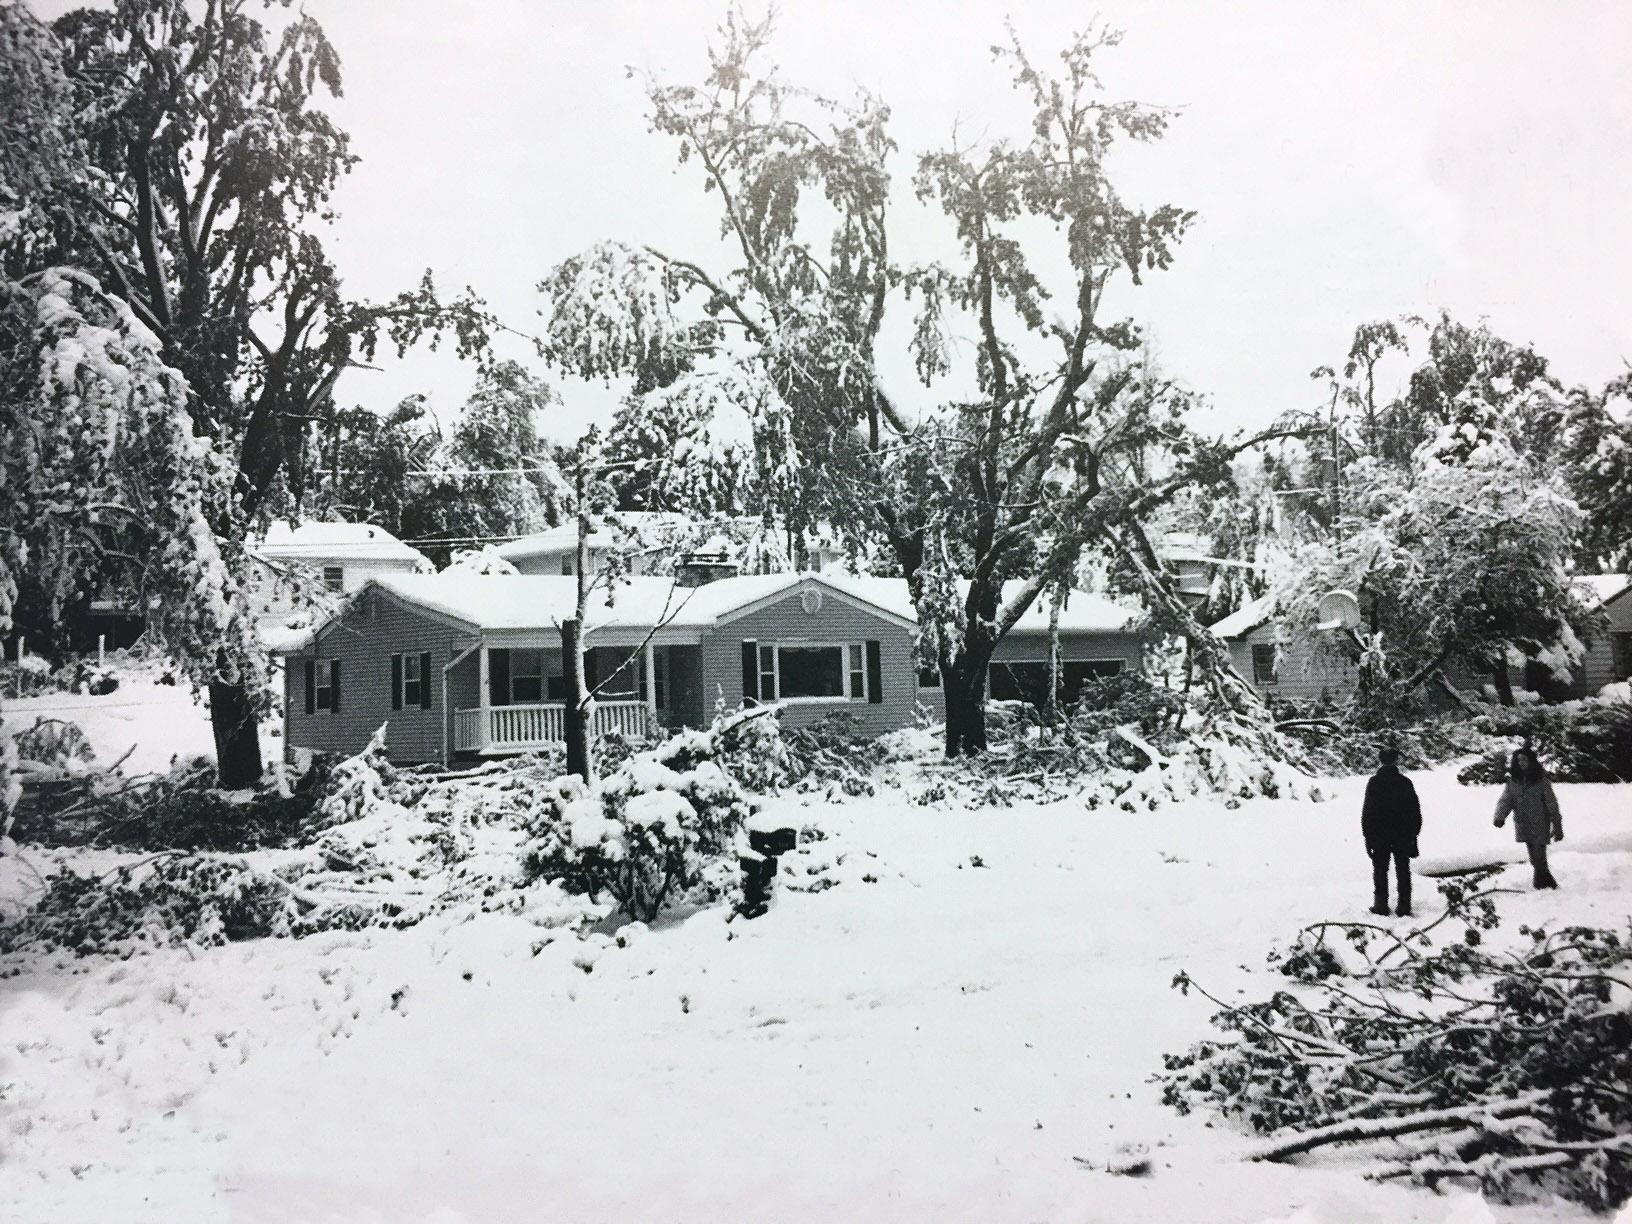 '97 snowstorm impact